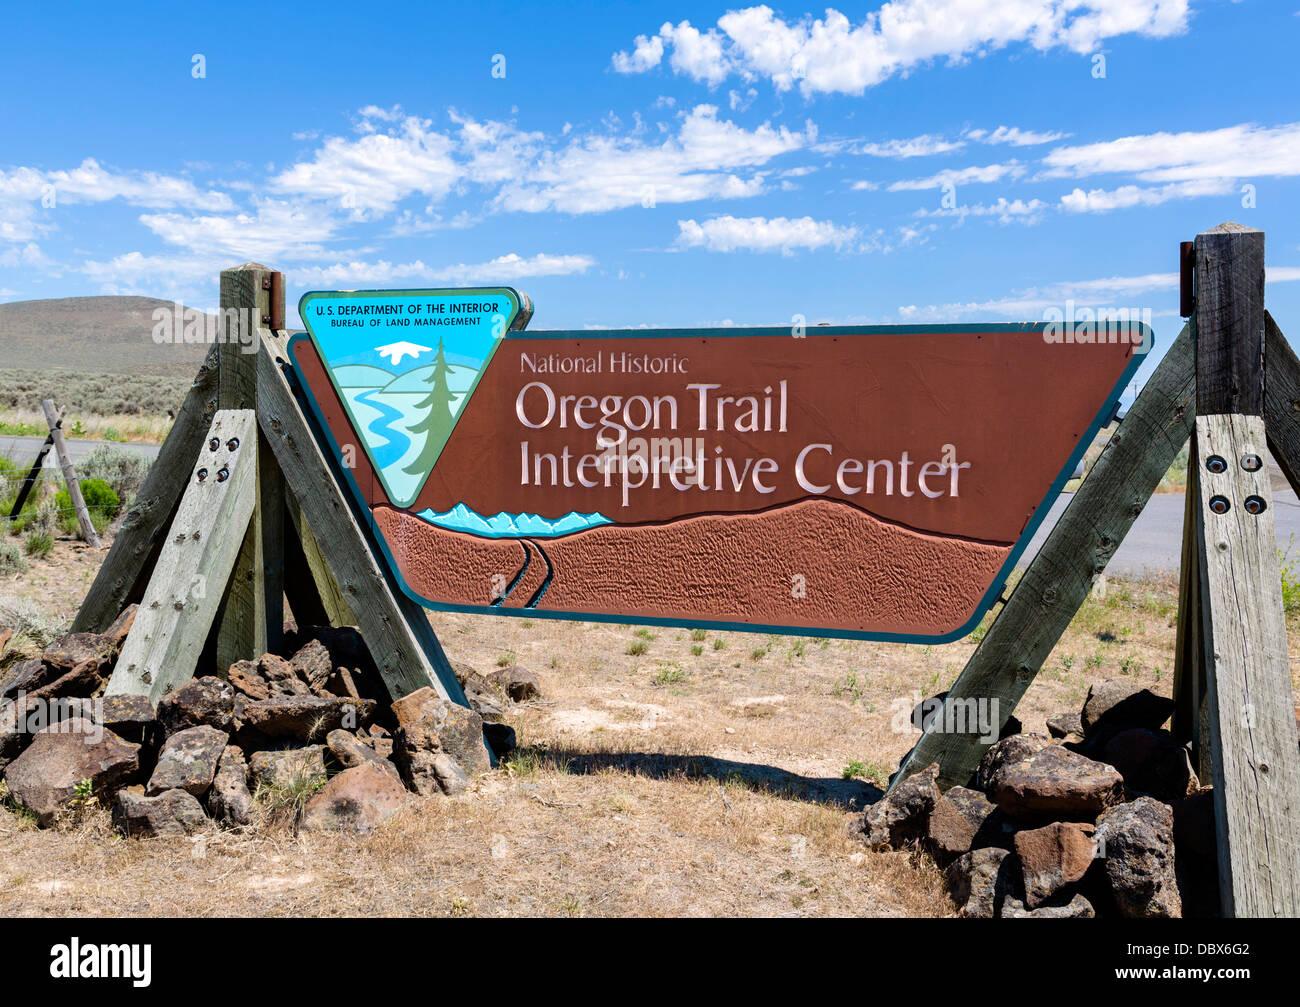 Entrance to the National Historic Oregon Trail Interpretive Center, Baker, Oregon, USA - Stock Image